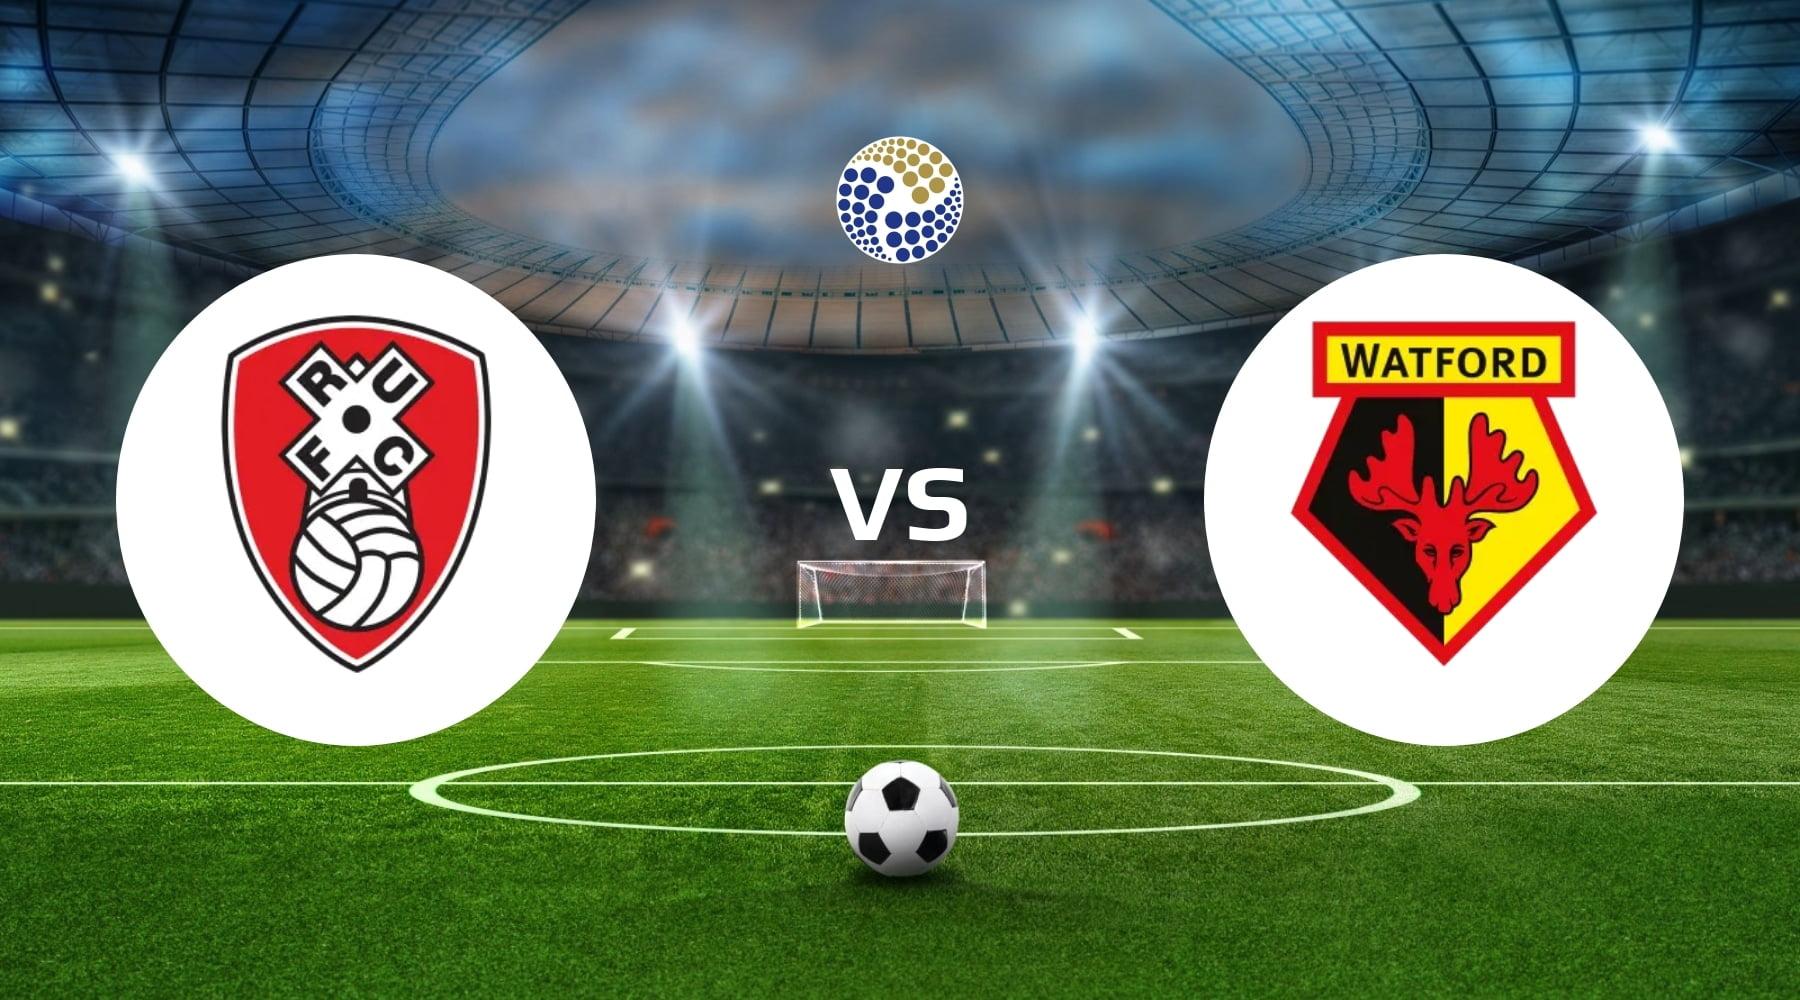 Rotherham United vs Watford Betting